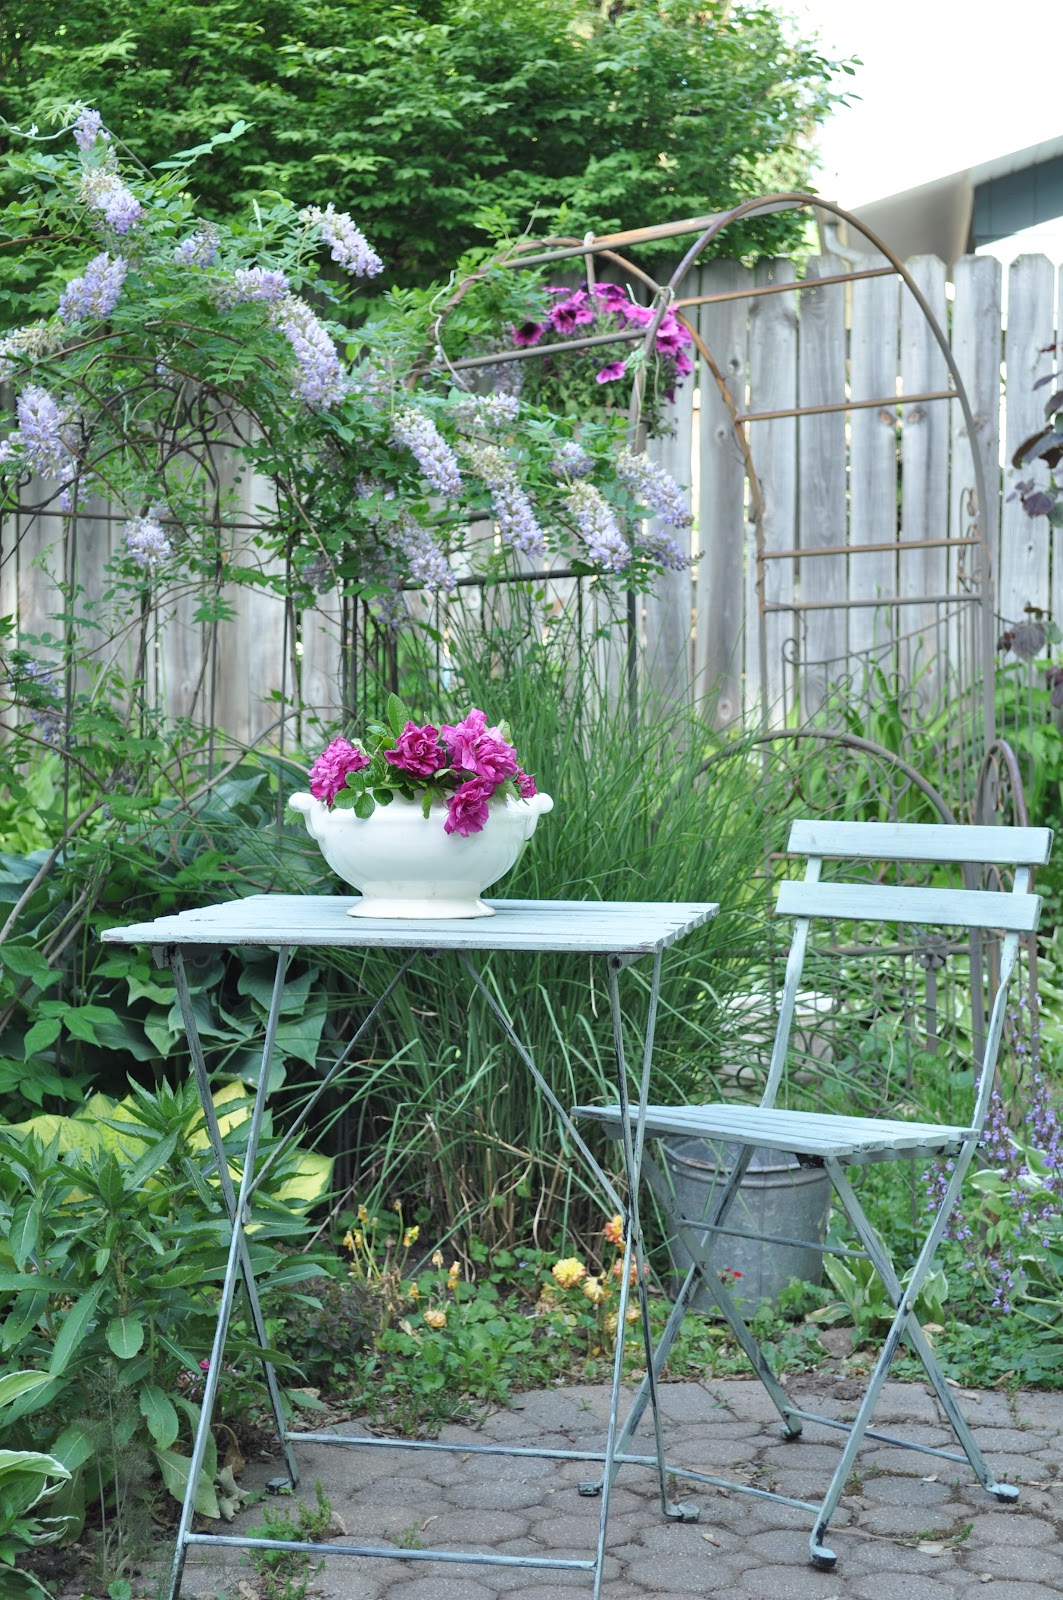 My Garden tour and garden ideas.... - Jennifer Rizzo